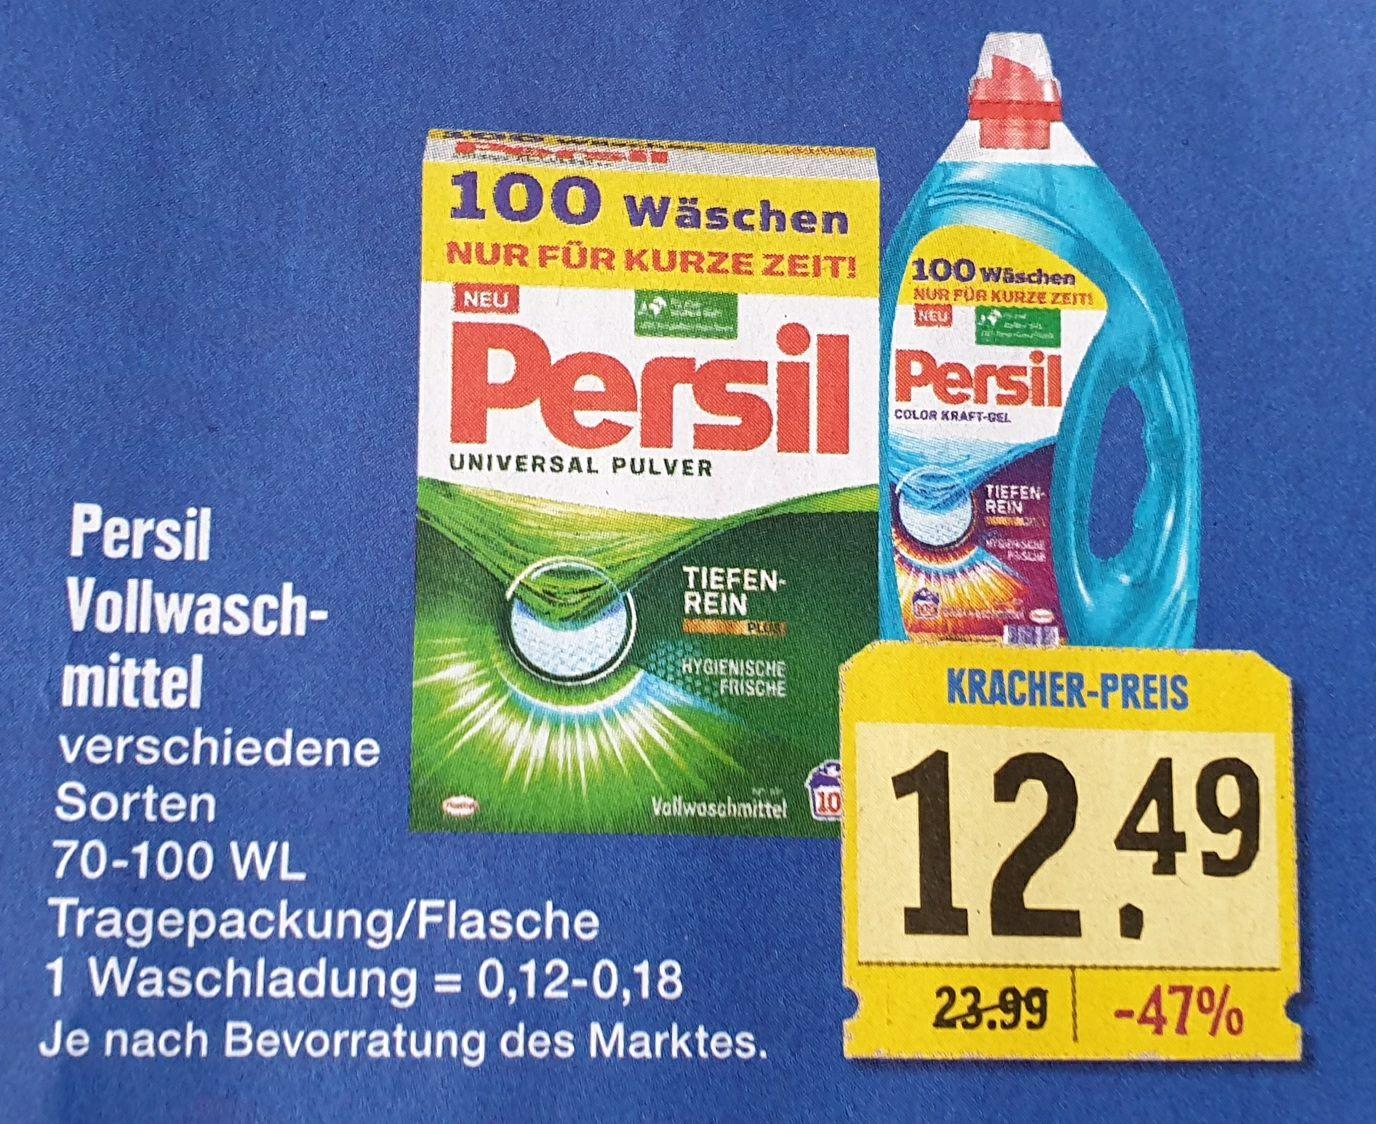 Persil Vollwaschmittel Universal Kraft-Gel (12ct/WL) (Lokal Edeka Höchner)